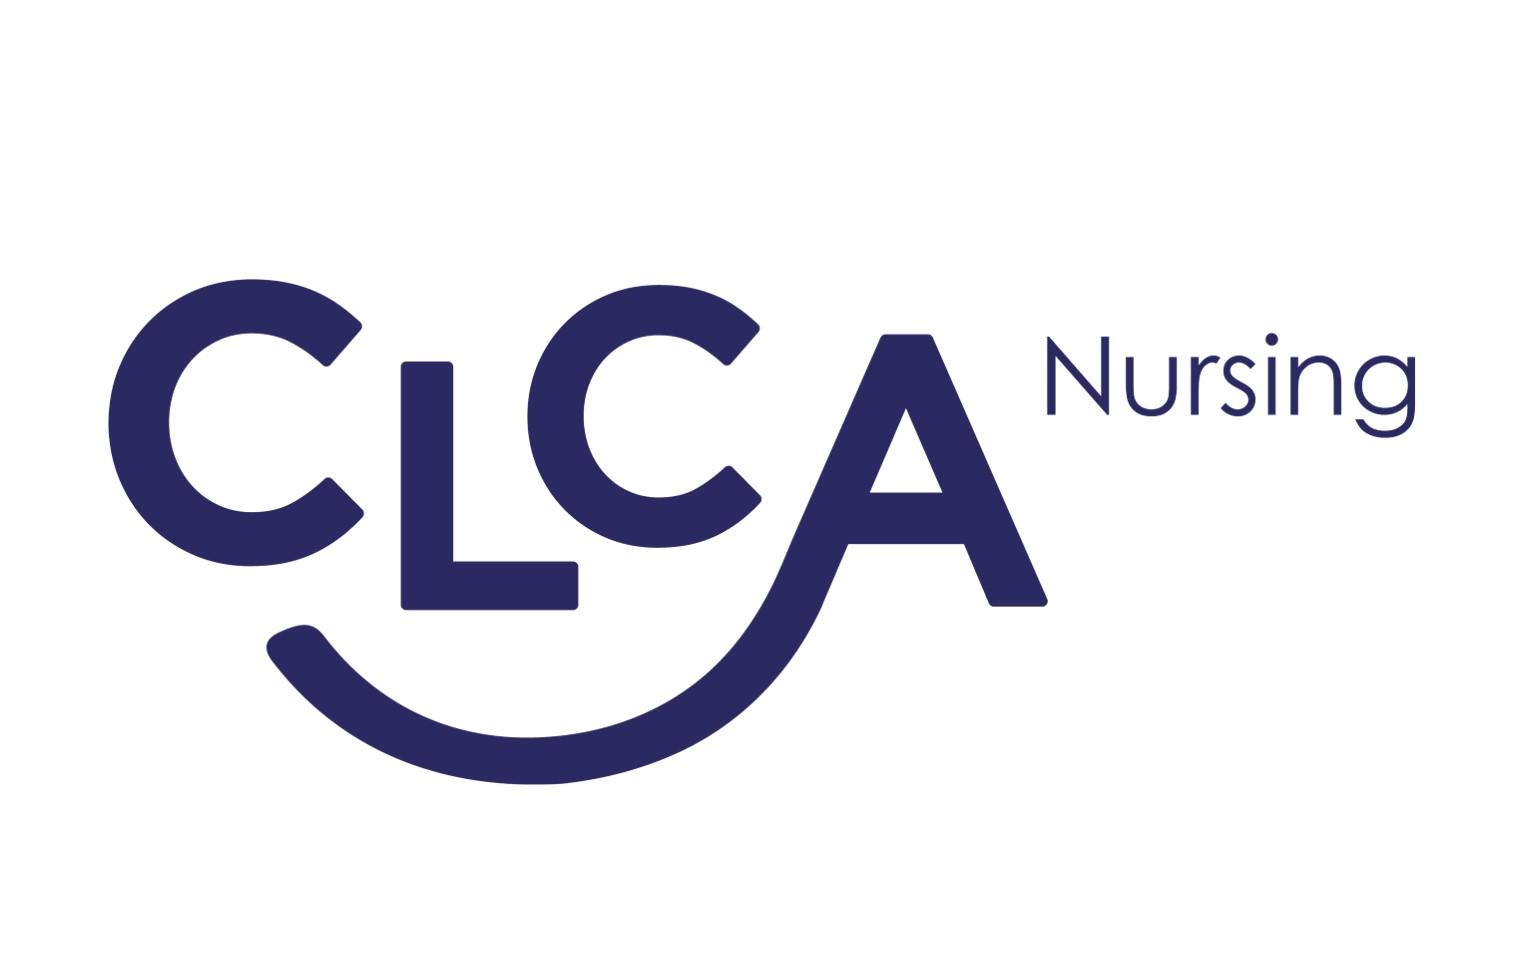 CLCA Nursing